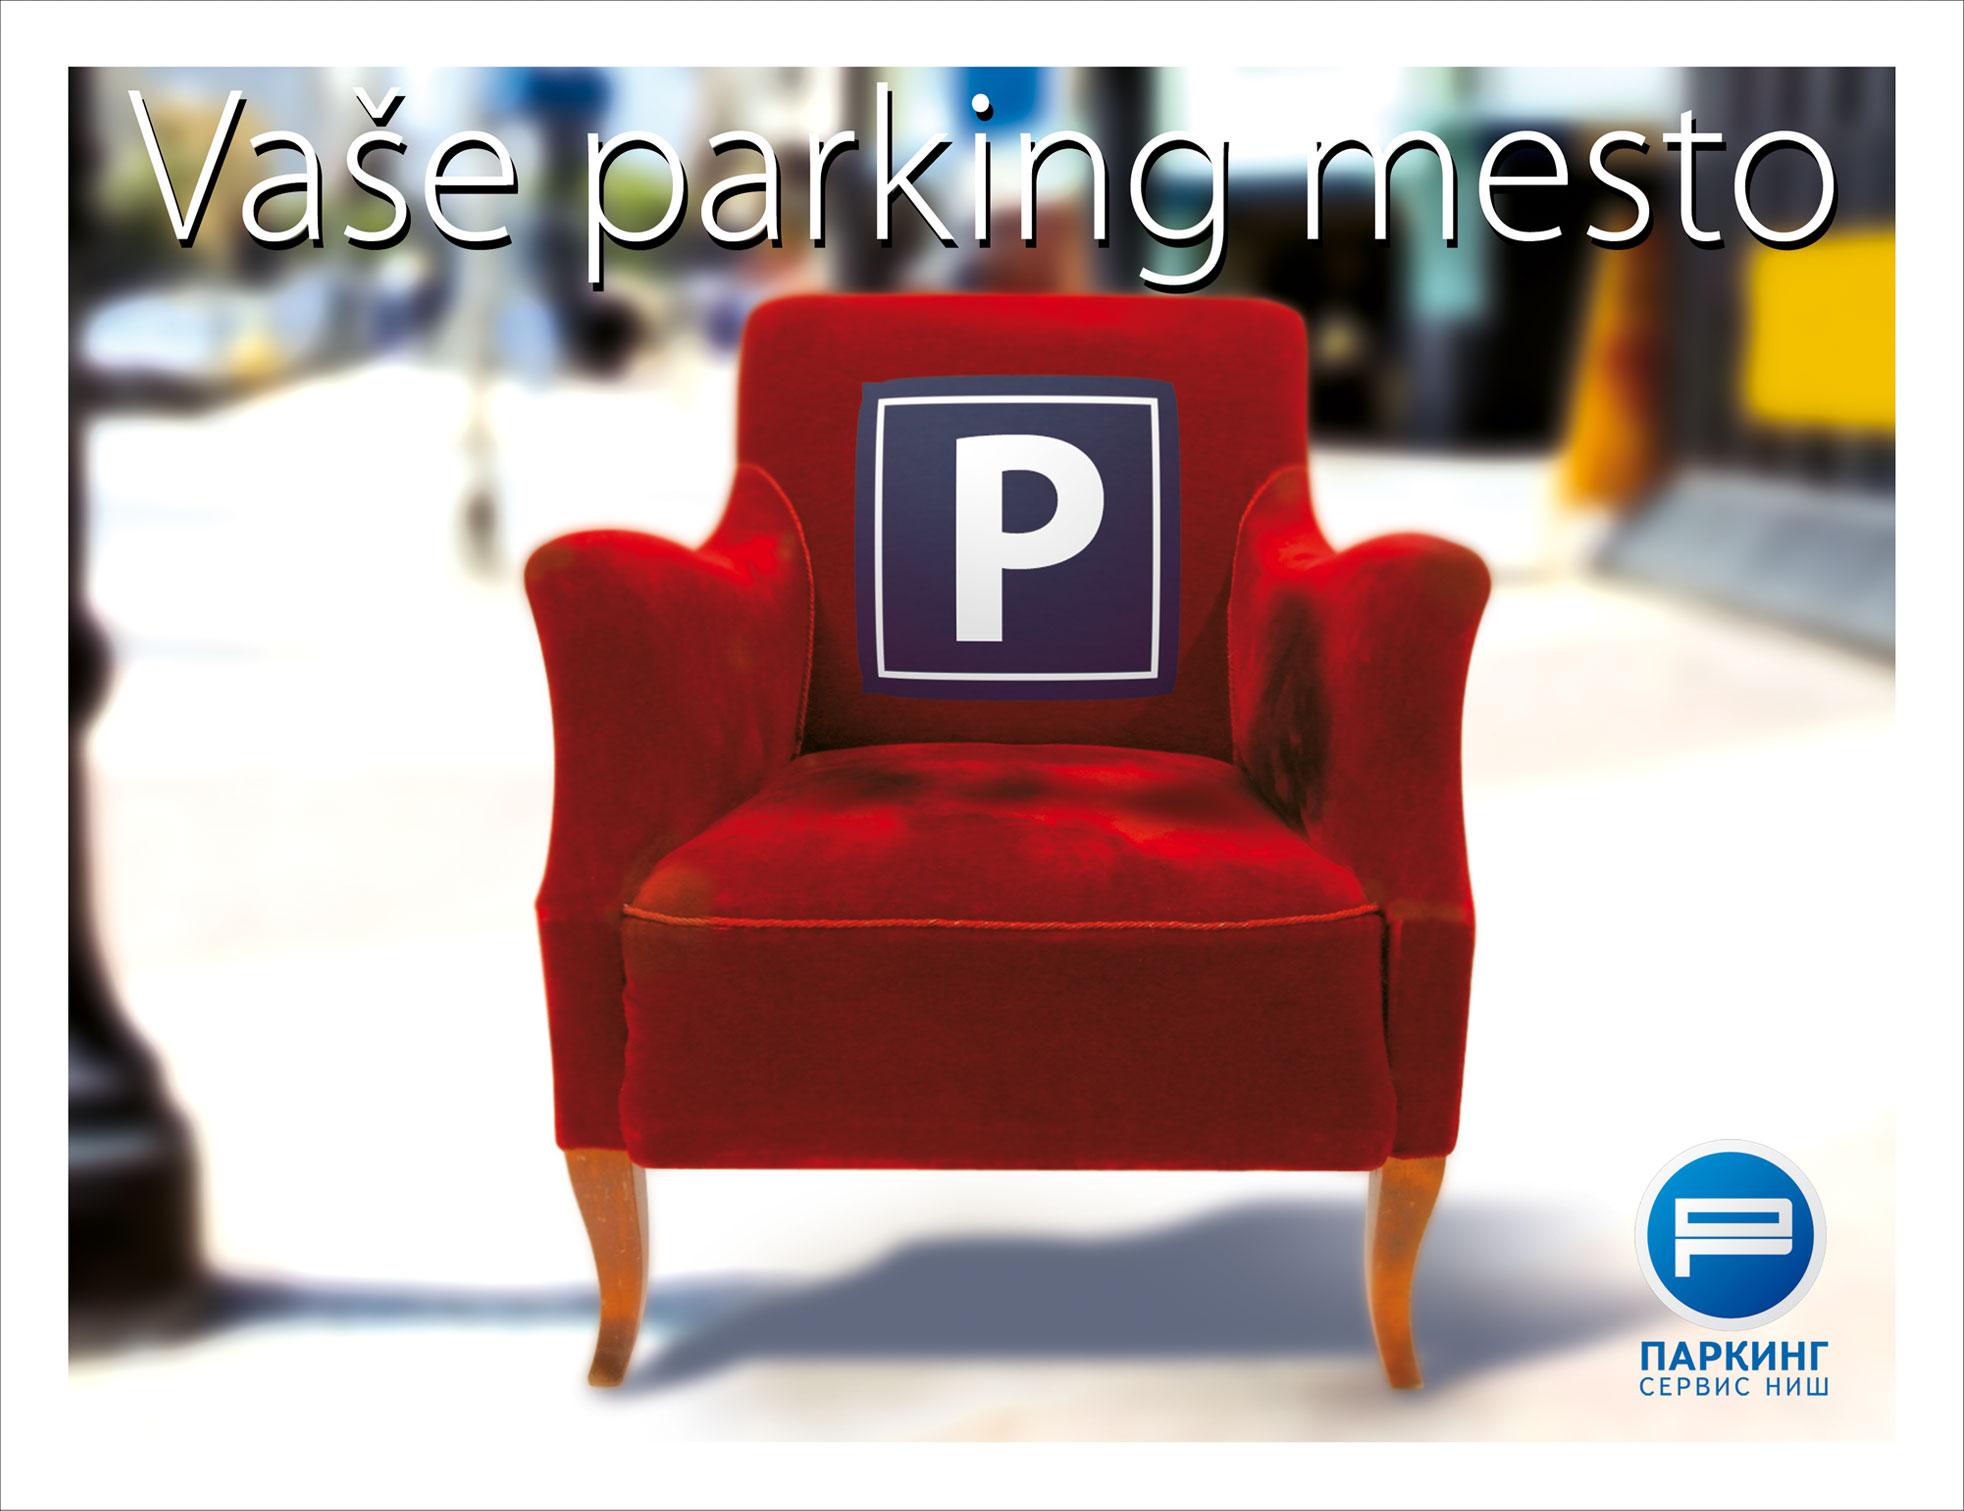 parking servis poster 1